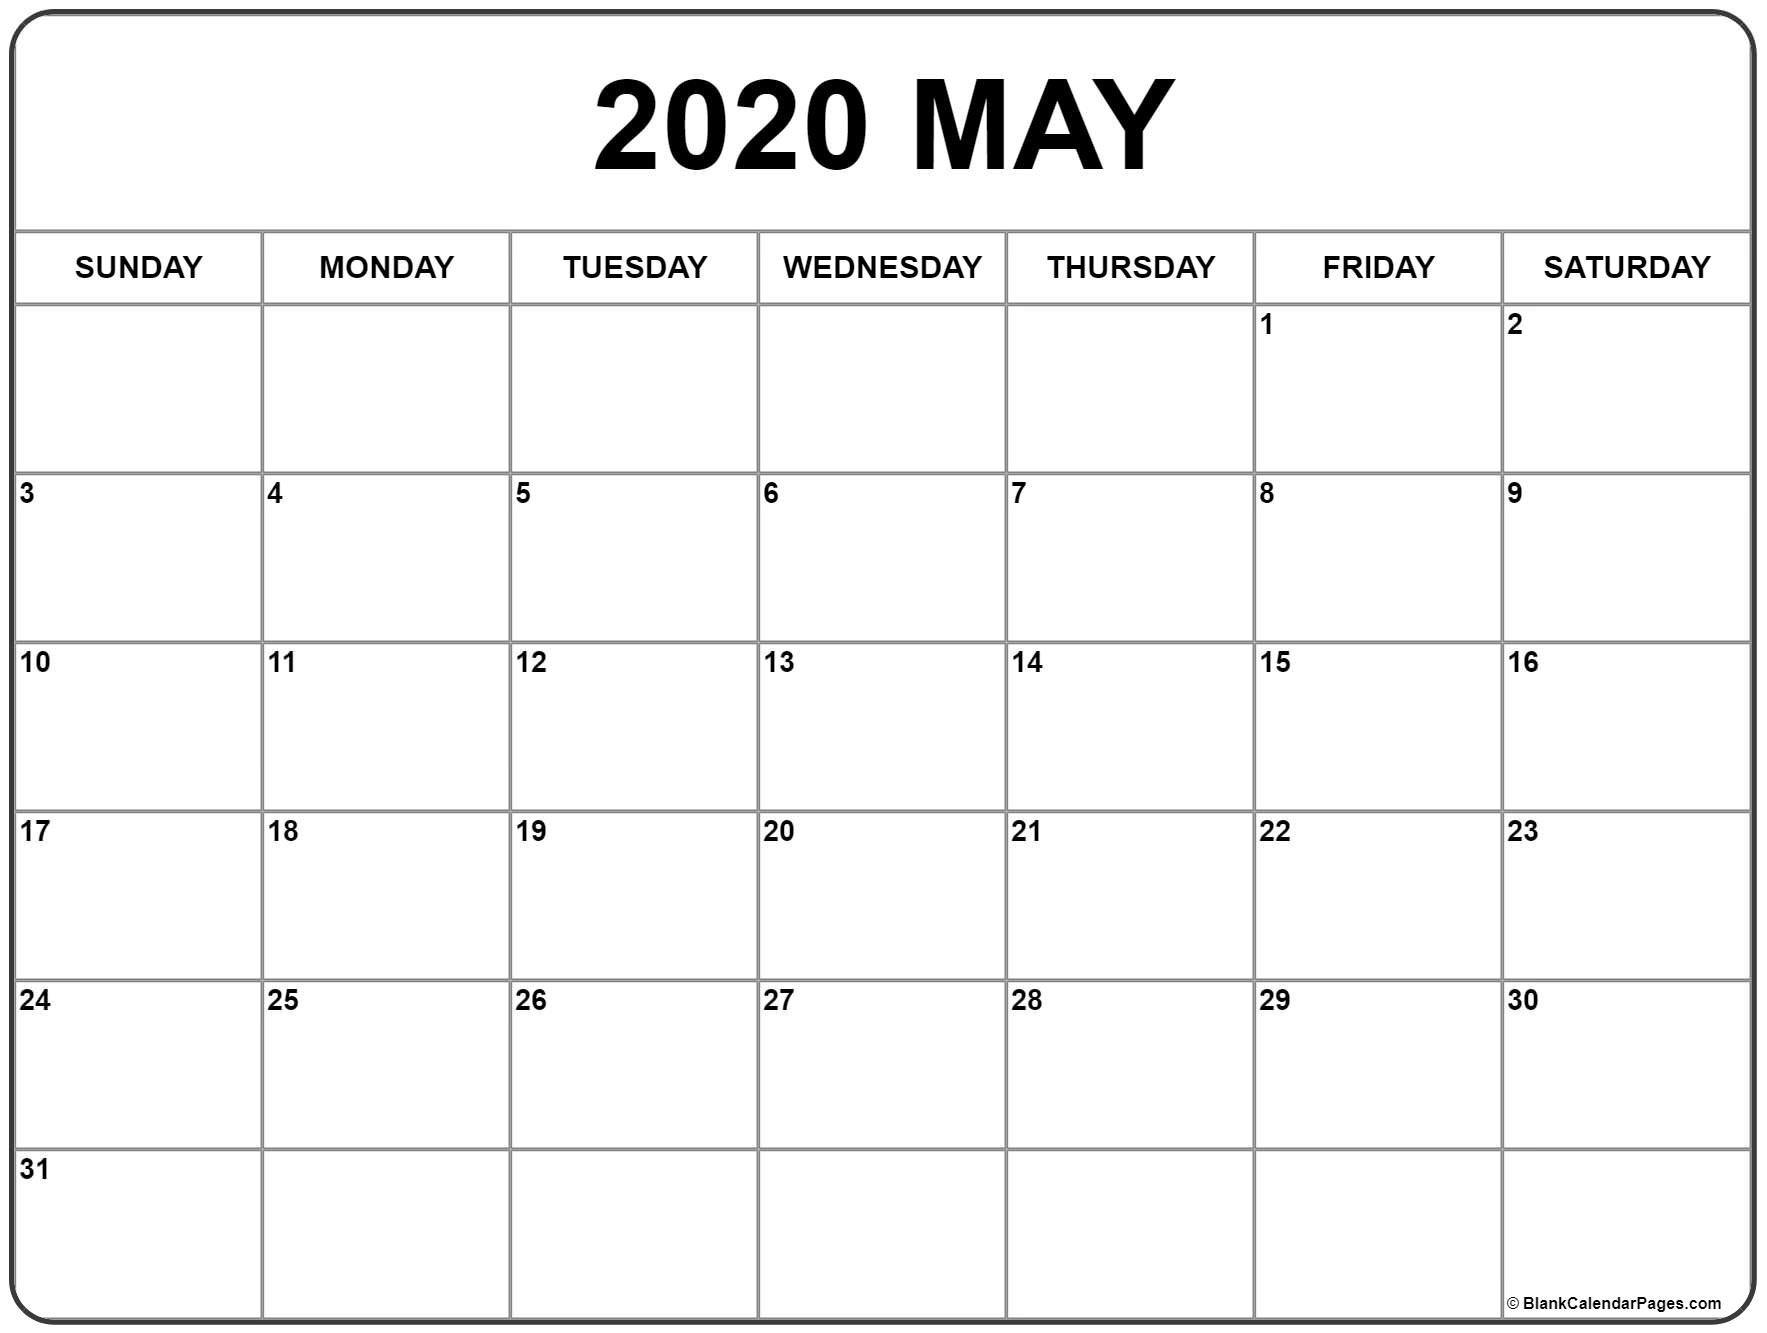 May 2020 Calendar | Free Printable Monthly Calendars Free No Download Printable Calendars